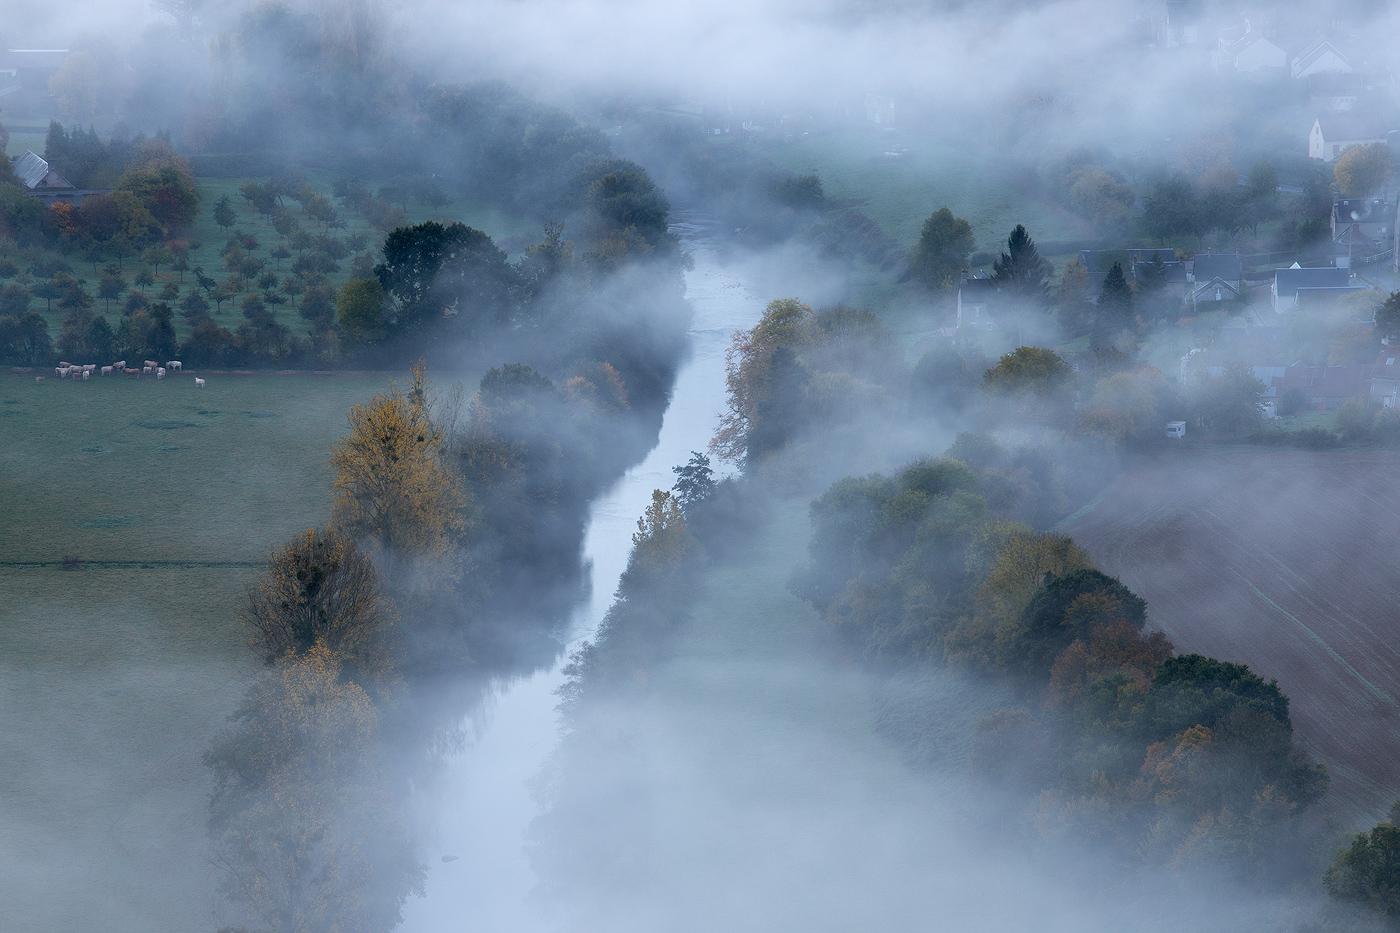 Suisse Normande - Nicolas Rottiers Photographe Caen Normandie